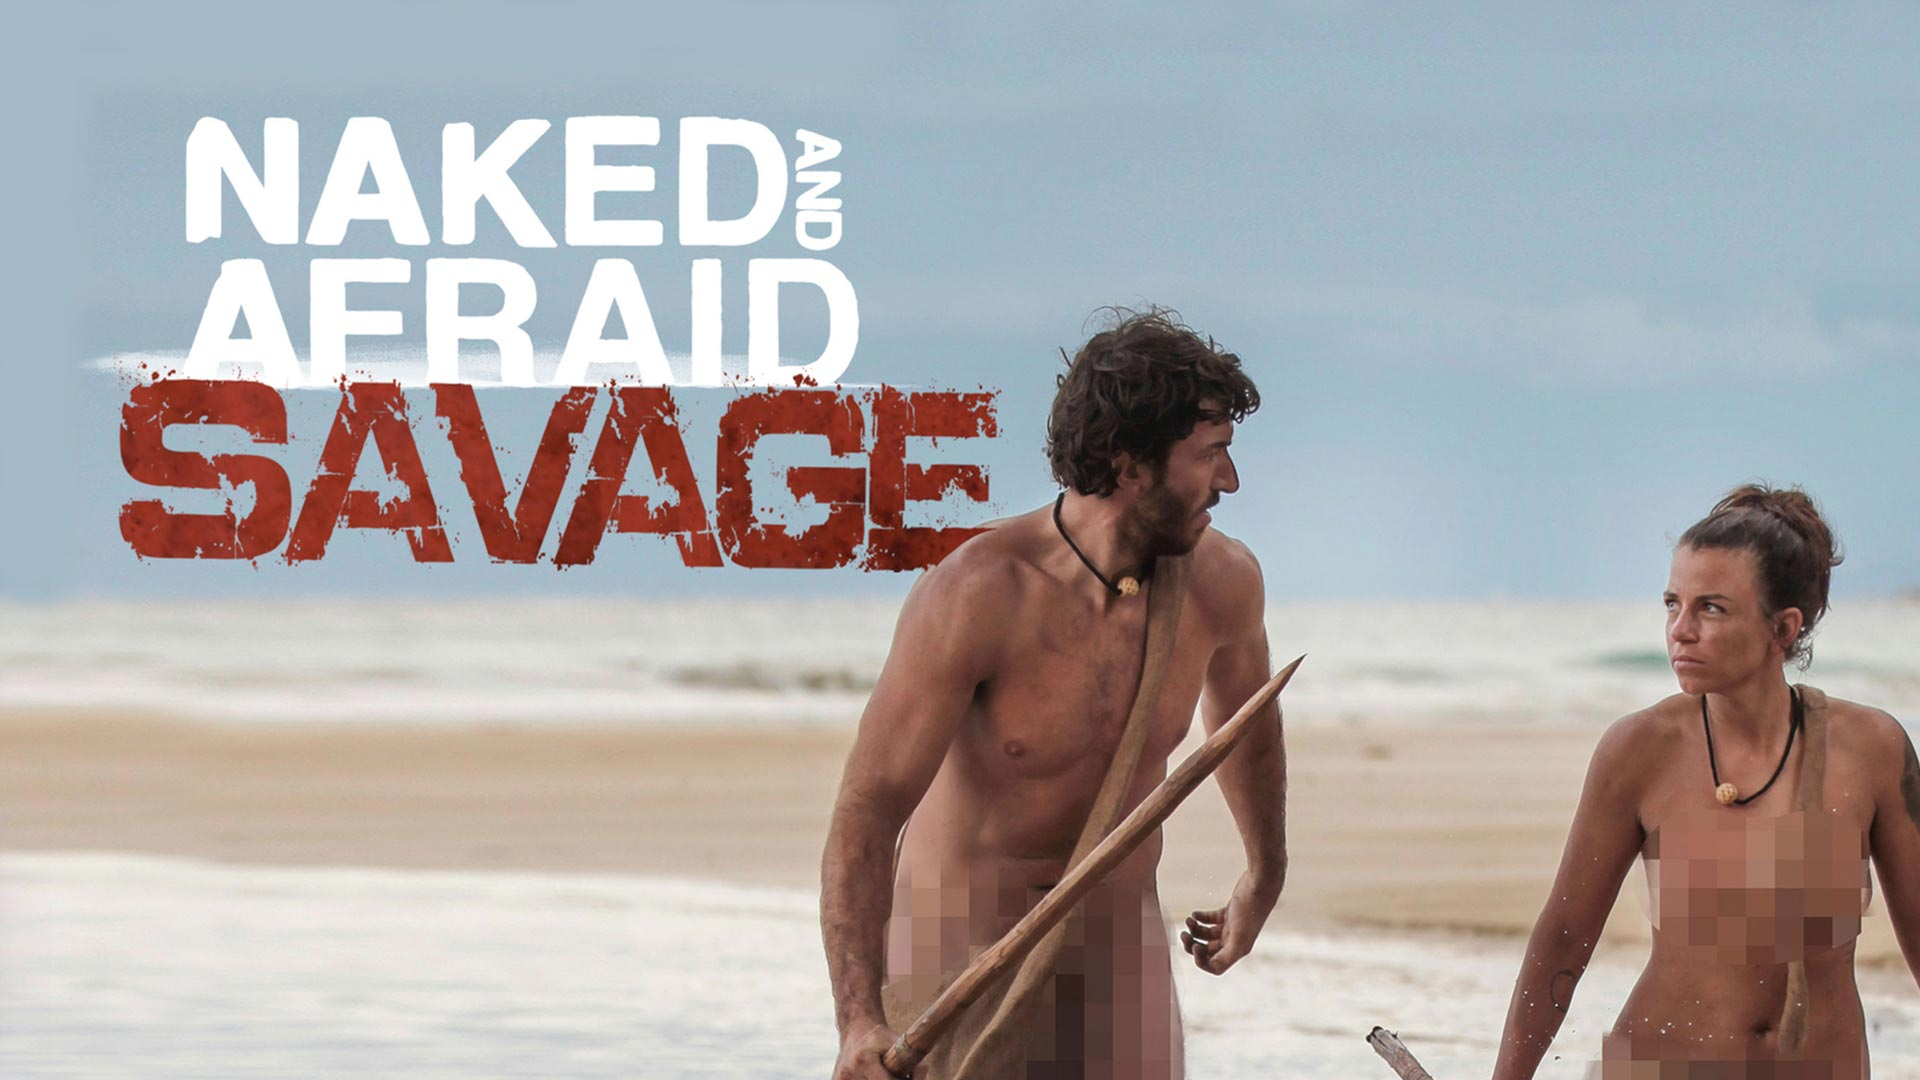 Naked and Afraid: Savage - Season 1